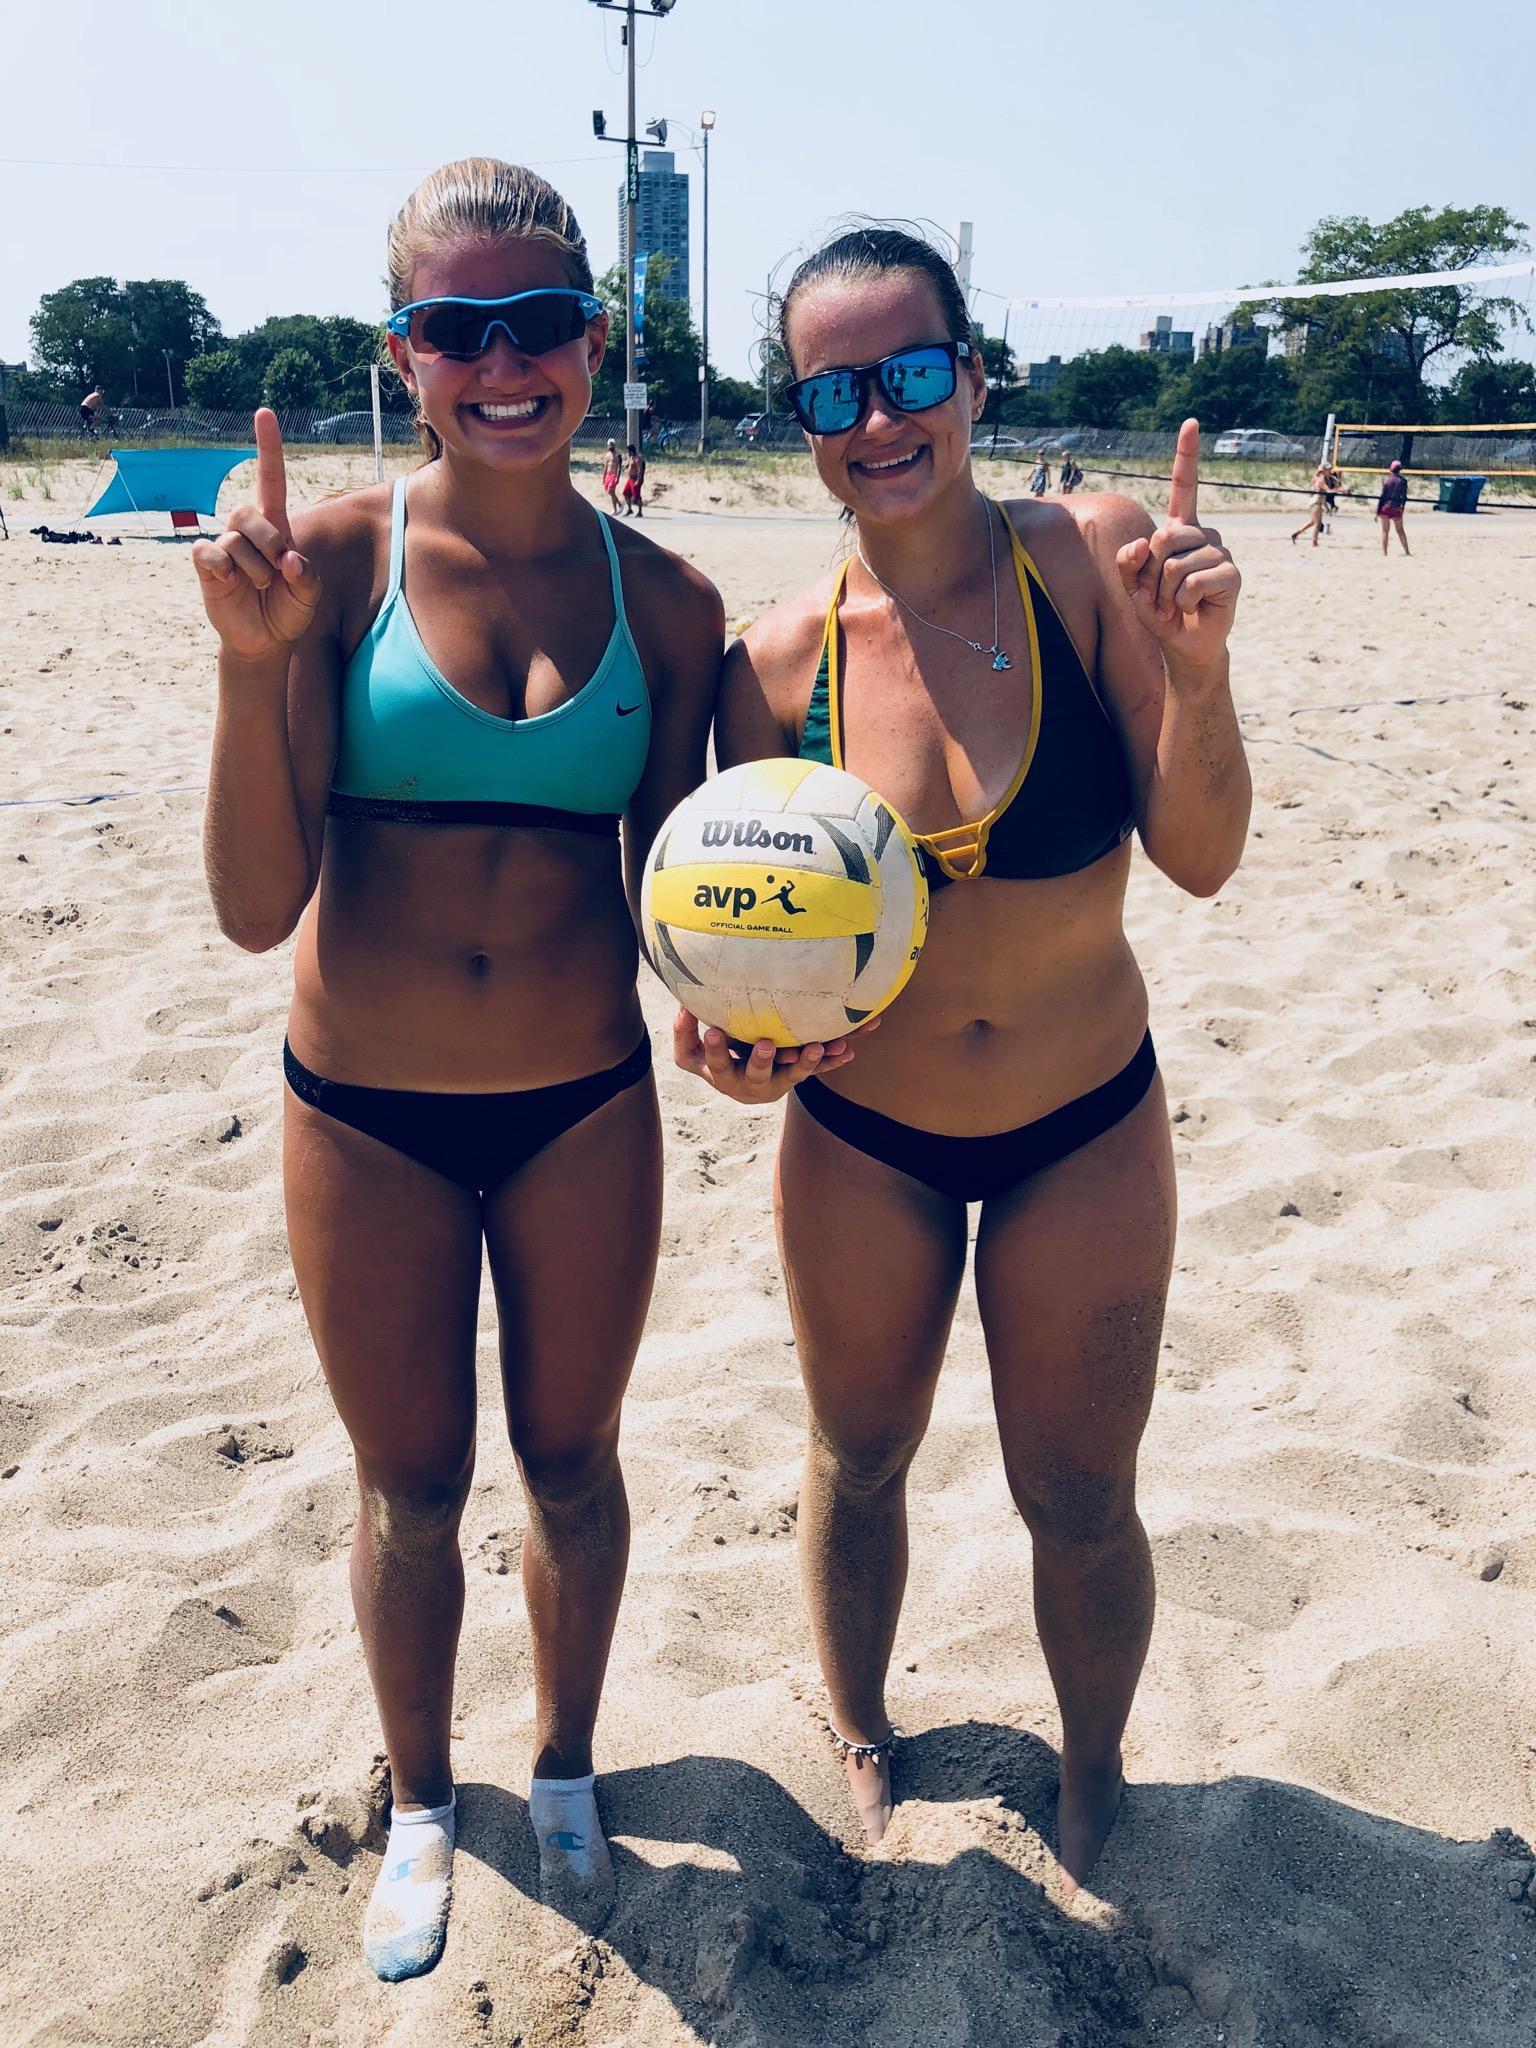 Projectu Collegiate Beach Clinics And Showcases Tmp Beach Volleyball